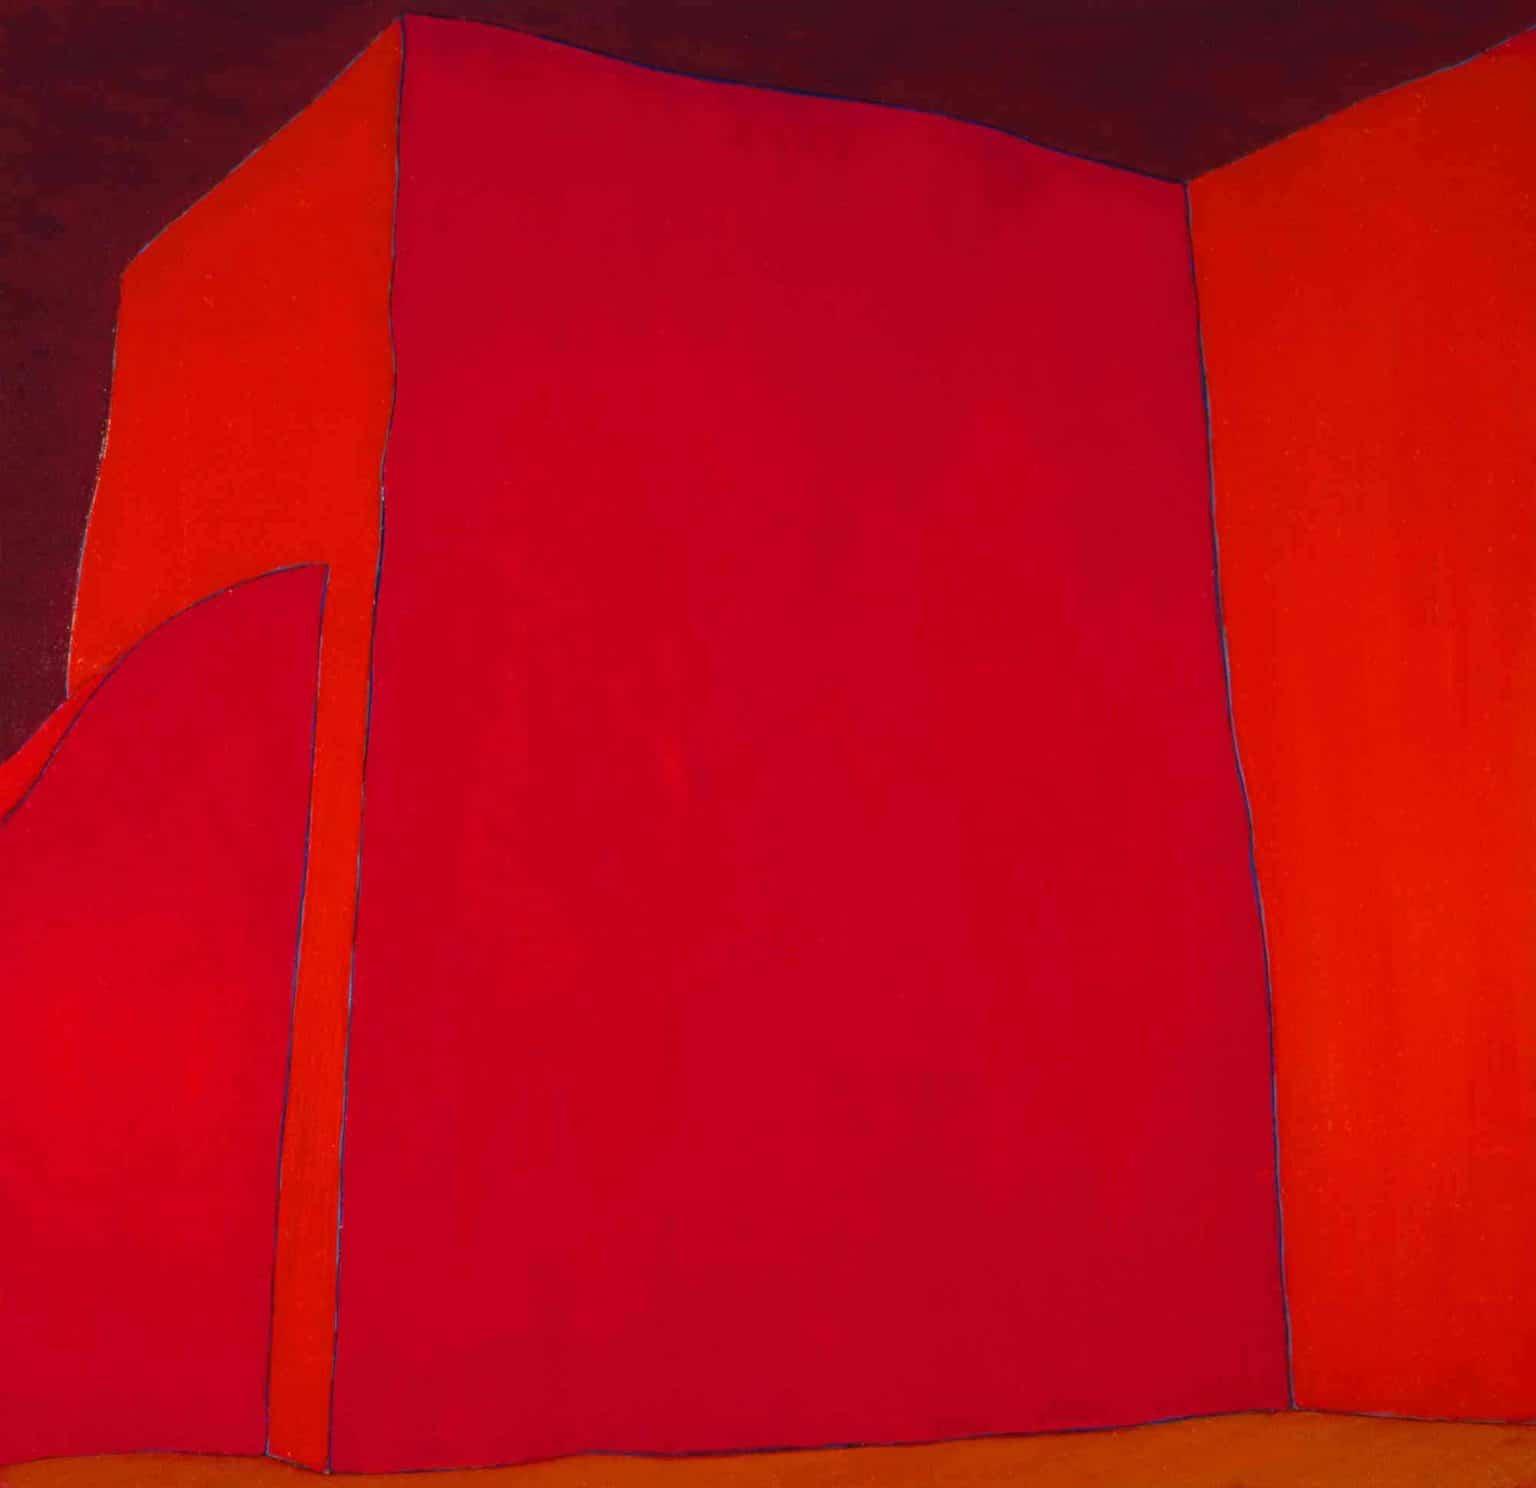 Harold Joe Waldrum church painting - Ranchos - 48 x 46.25 acrylic on canvas